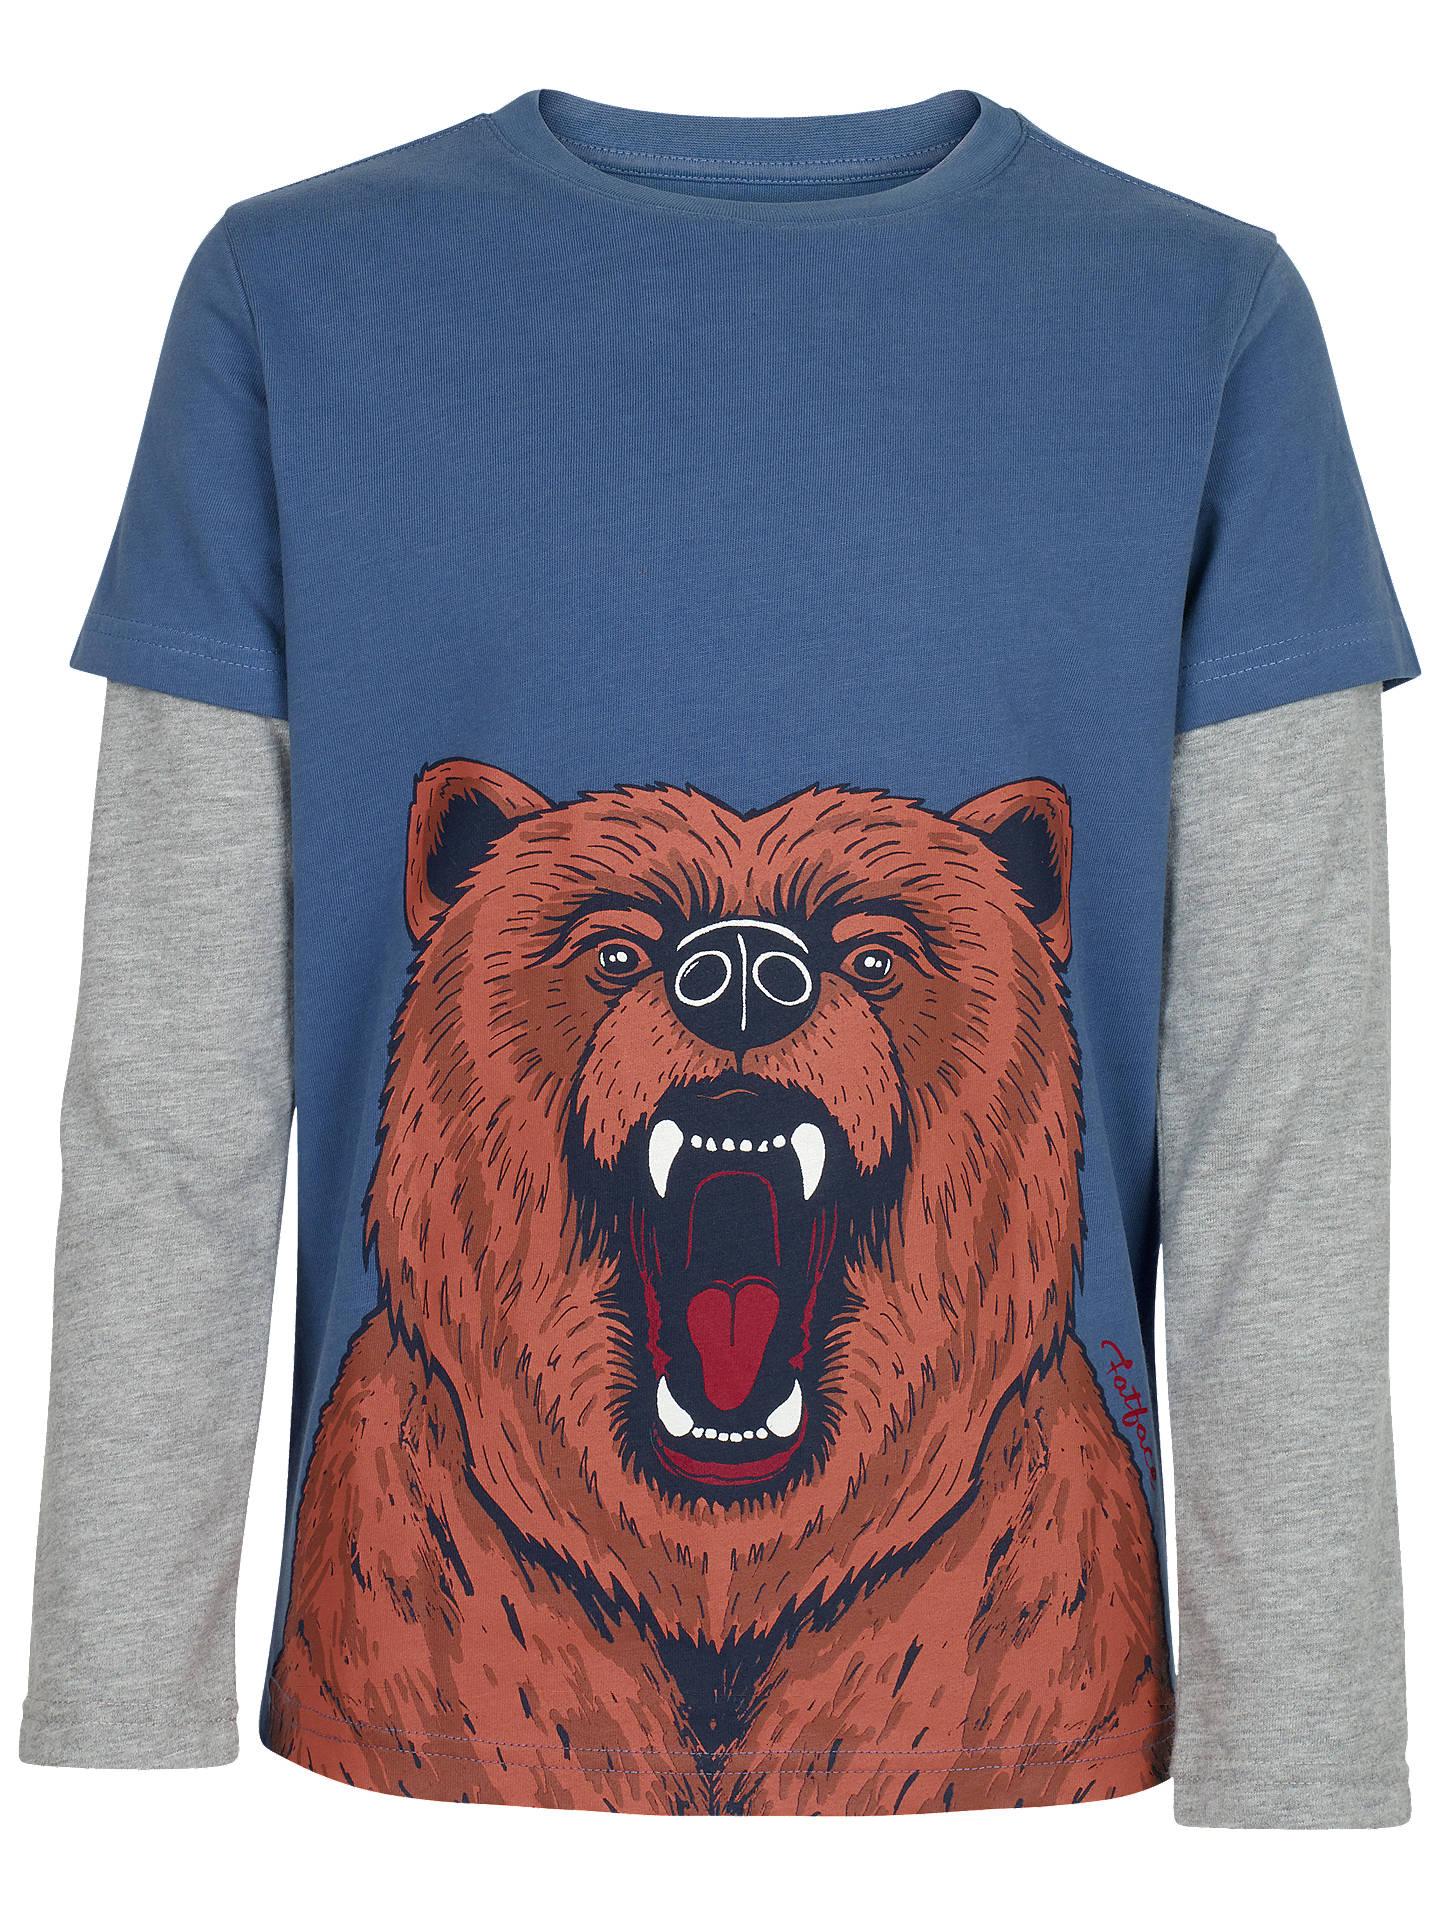 4e1f3da2 Fat Face Boys' Bear Print Long Sleeve T-Shirt, Slate Blue at John ...